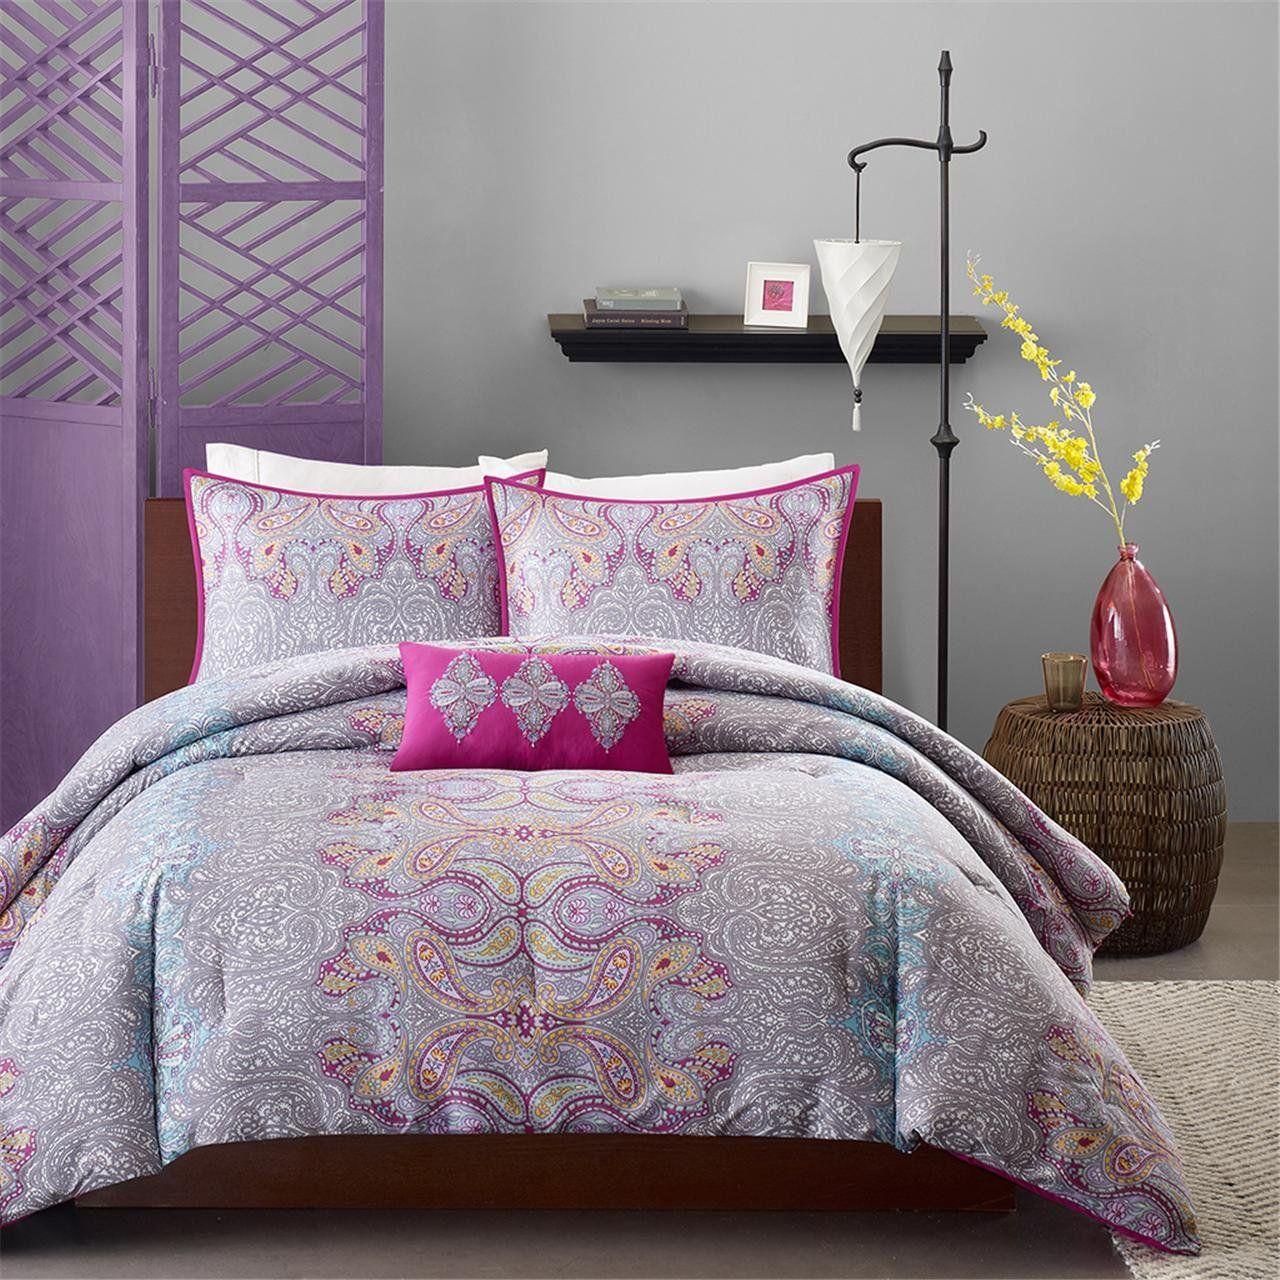 MiZone Keisha Comforter Set Twin/Twin XL Size Fuchsia